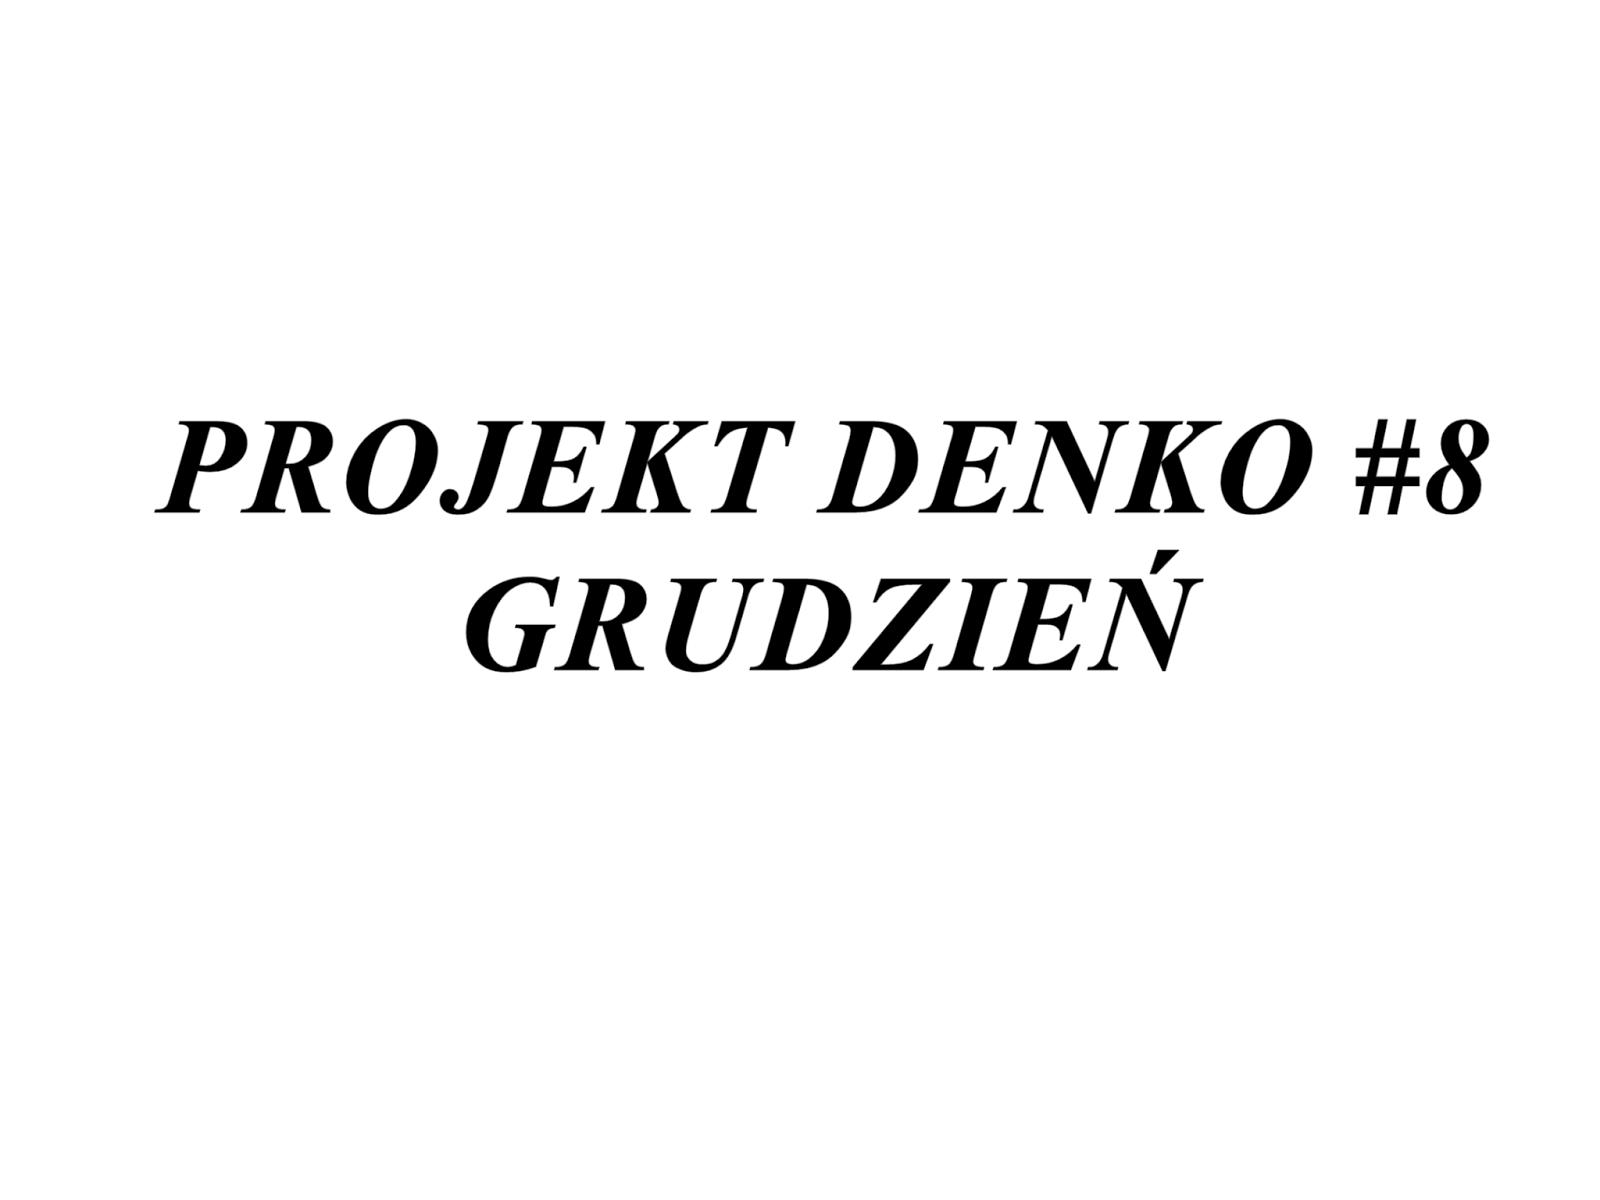 Projekt denko #8 | grudzień 2017